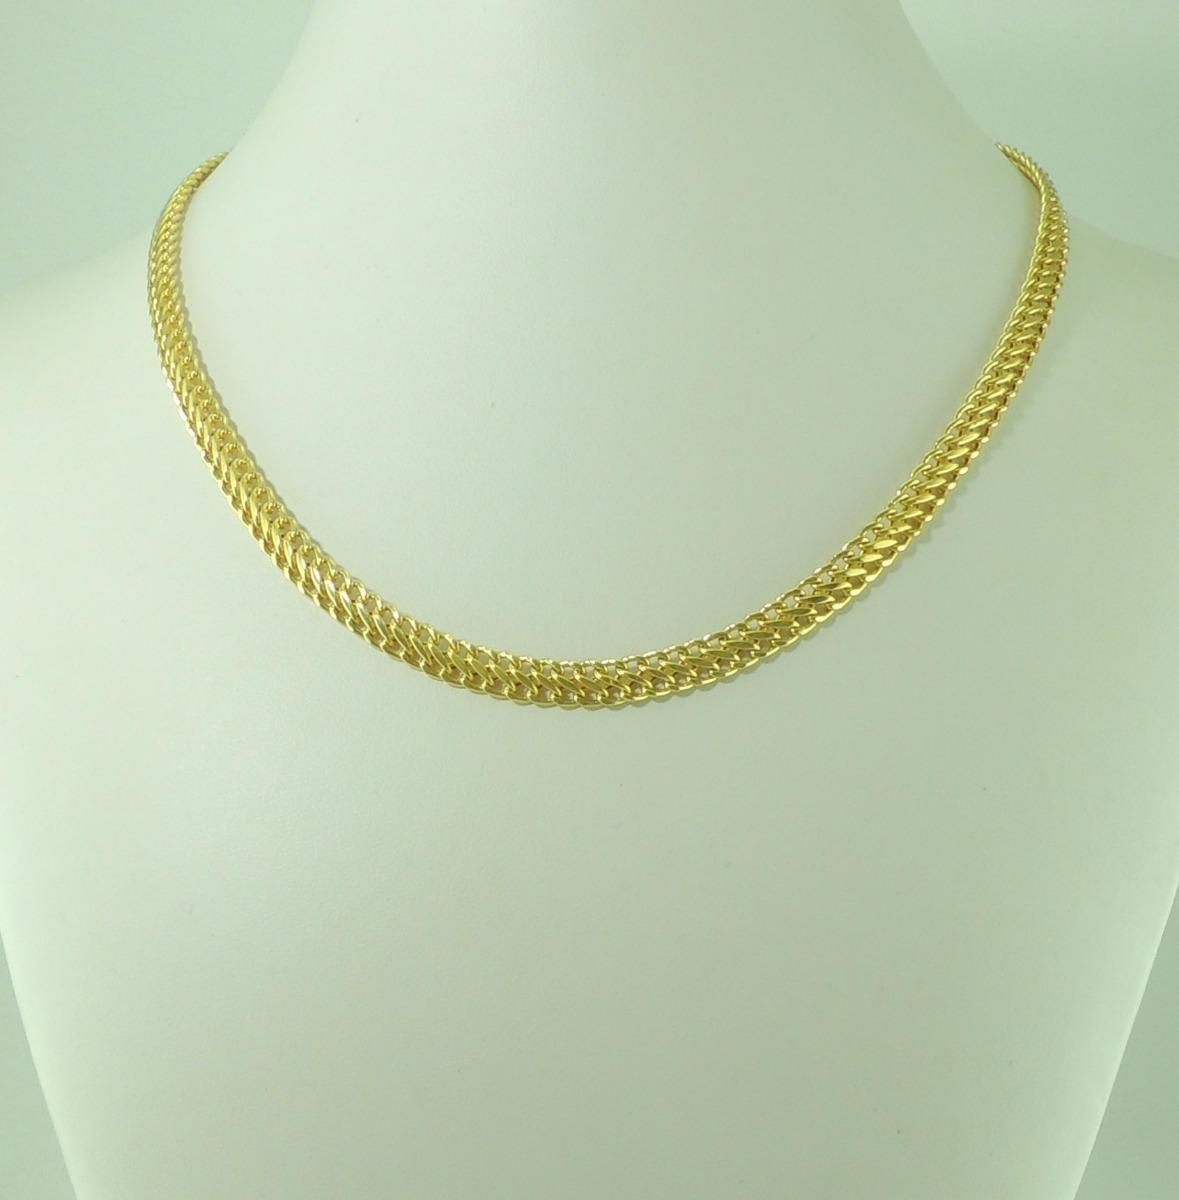 5490e5c1f4af8 linda gargantilha corrente lacraia ouro 18k 750 45cm 6mm. Carregando zoom.